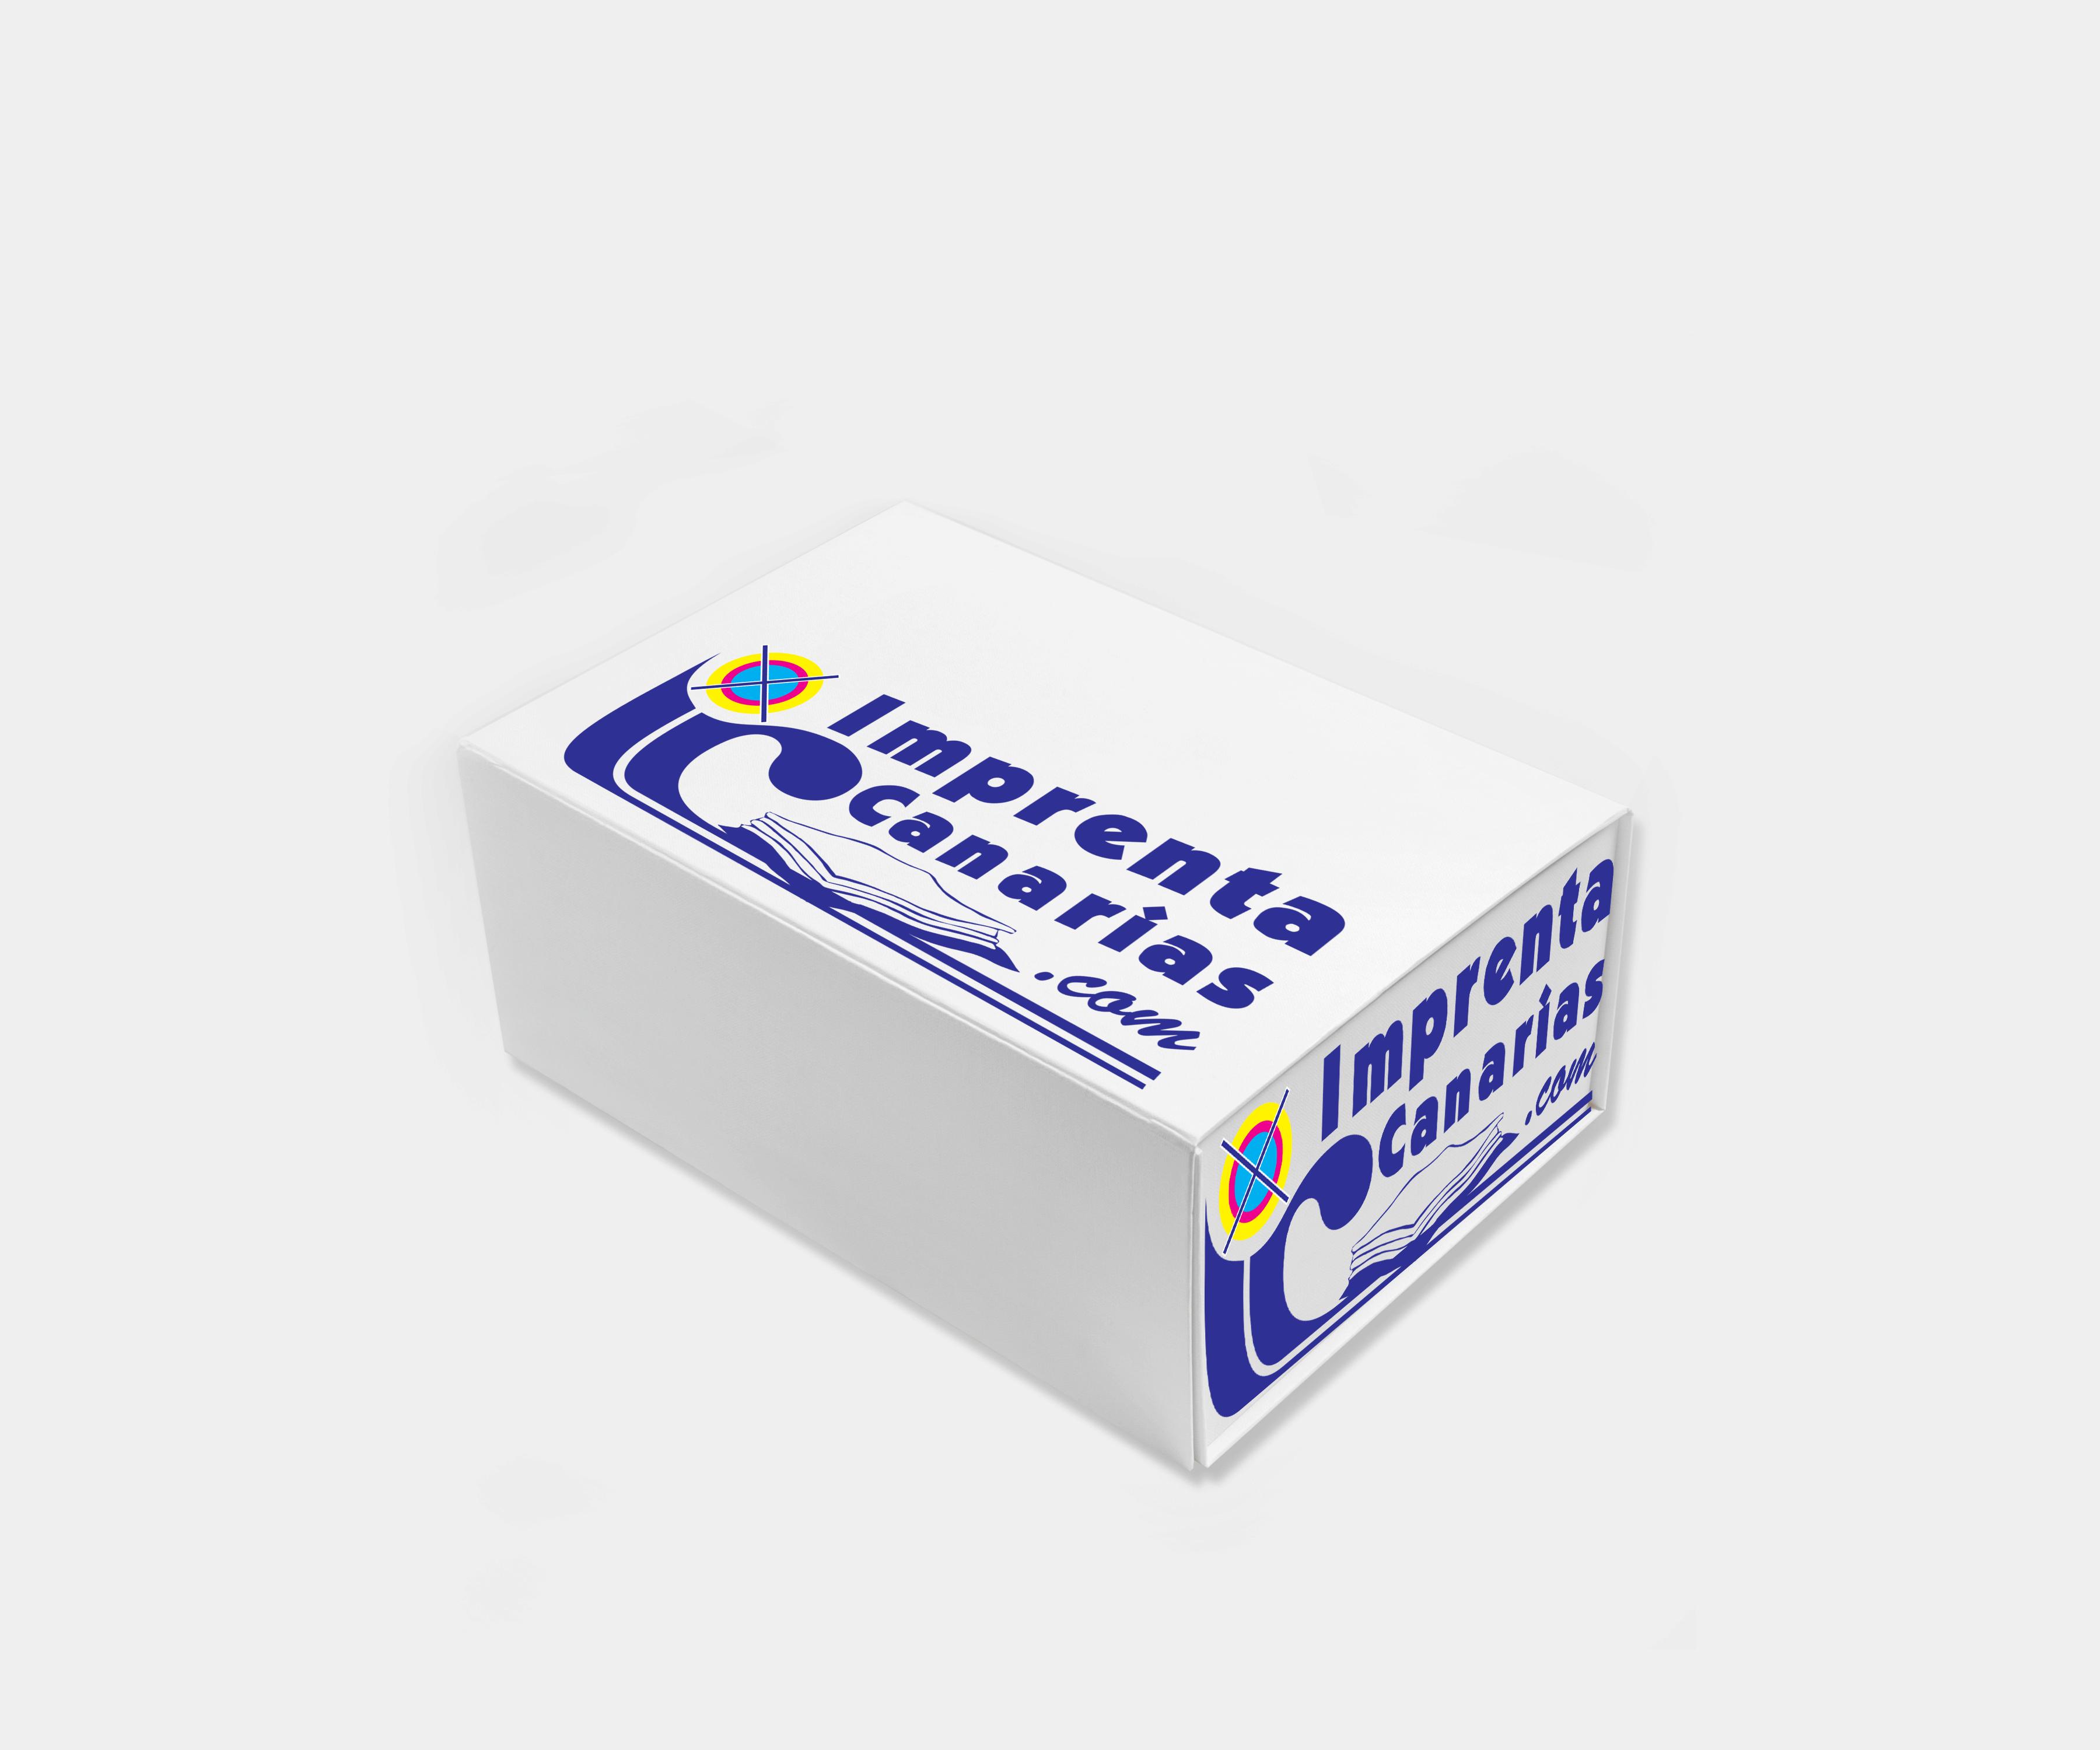 Packaging Tenerife :: Imprenta Canarias